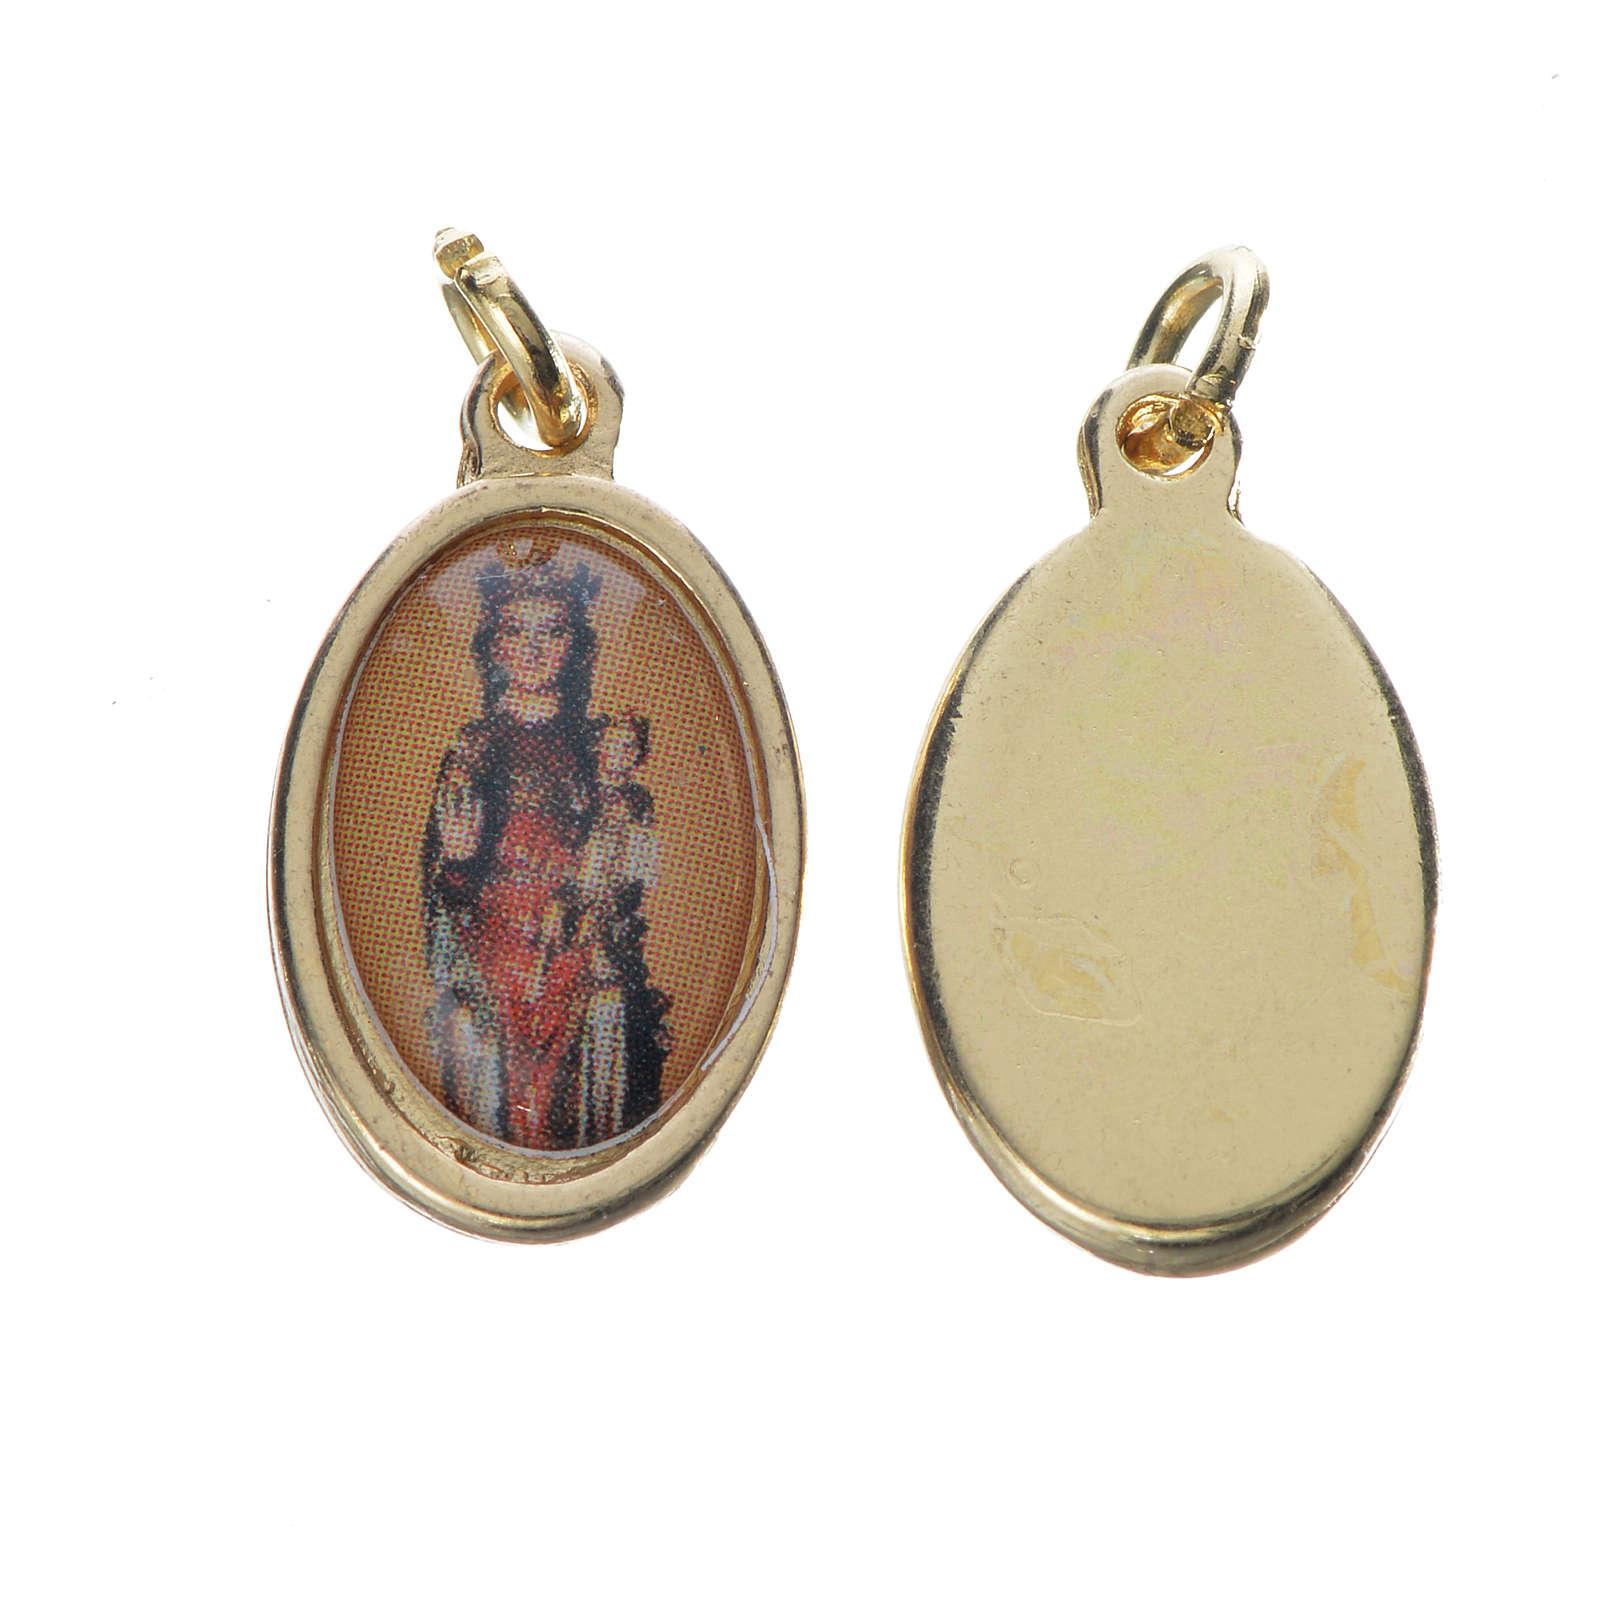 Medaglia N.D. de Fenestre metallo dorato 1,5cm 4